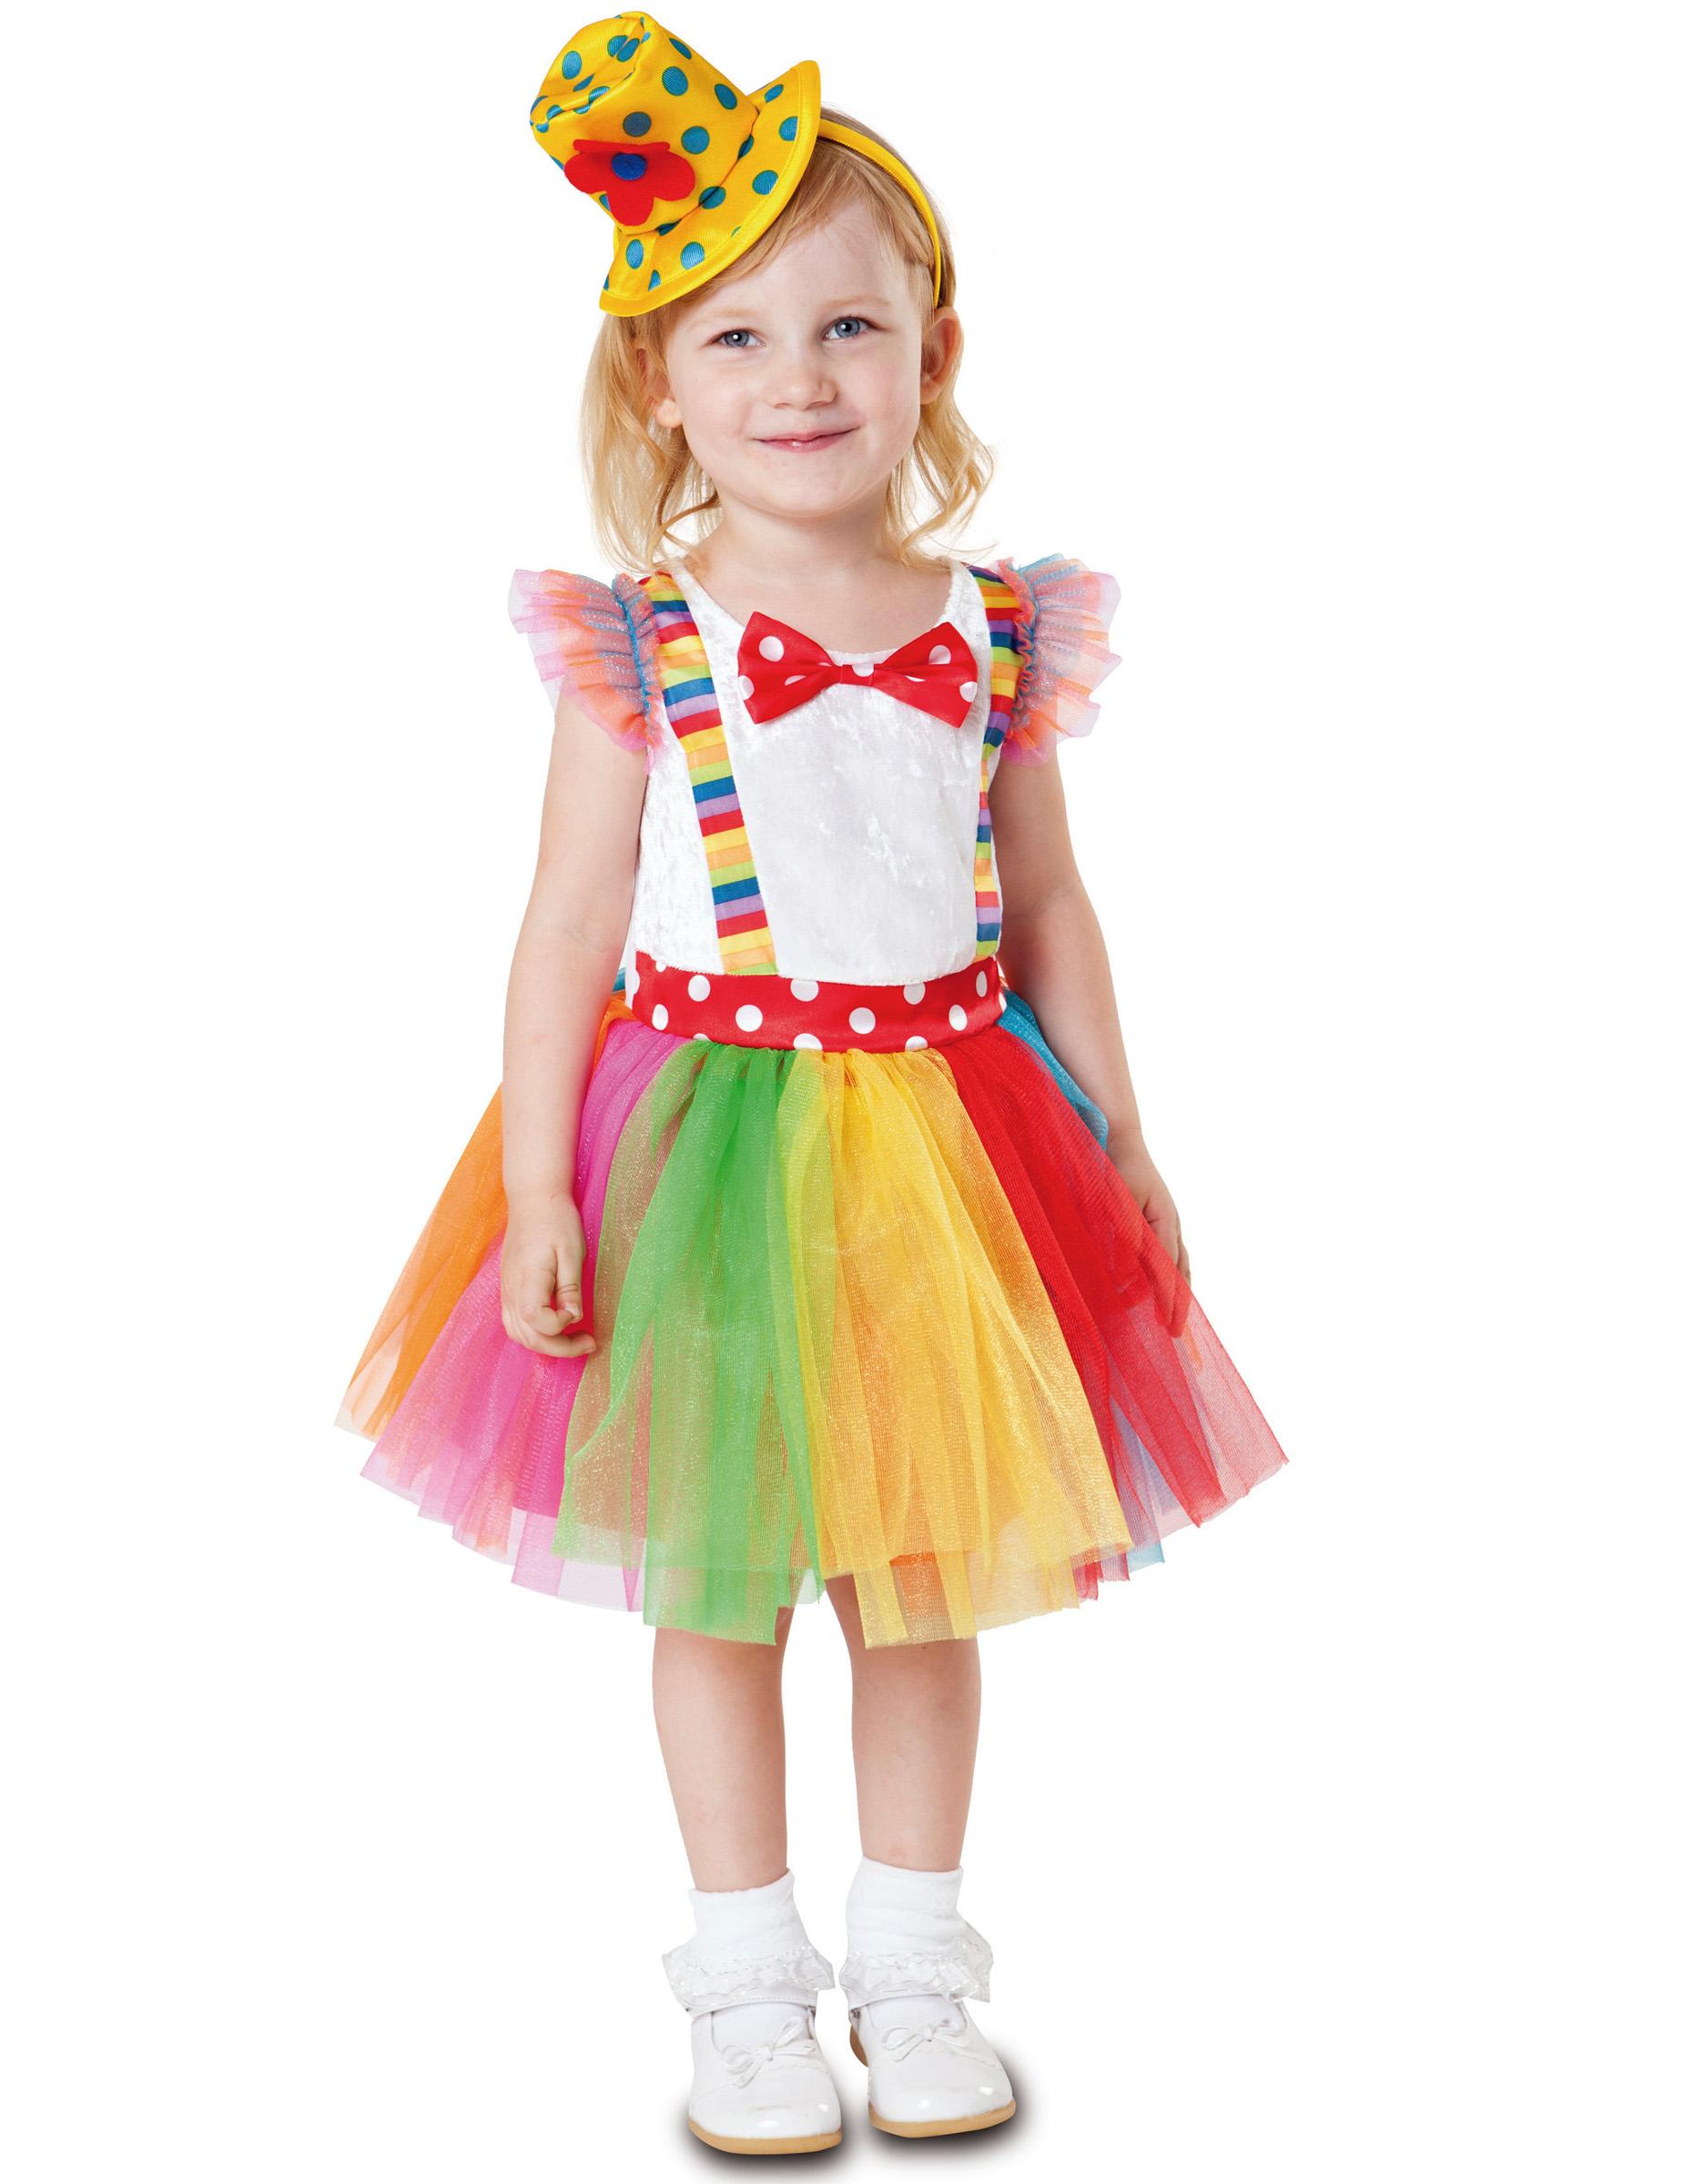 Kostum Clown Tutu Fur Madchen Gunstige Faschings Kostume Bei